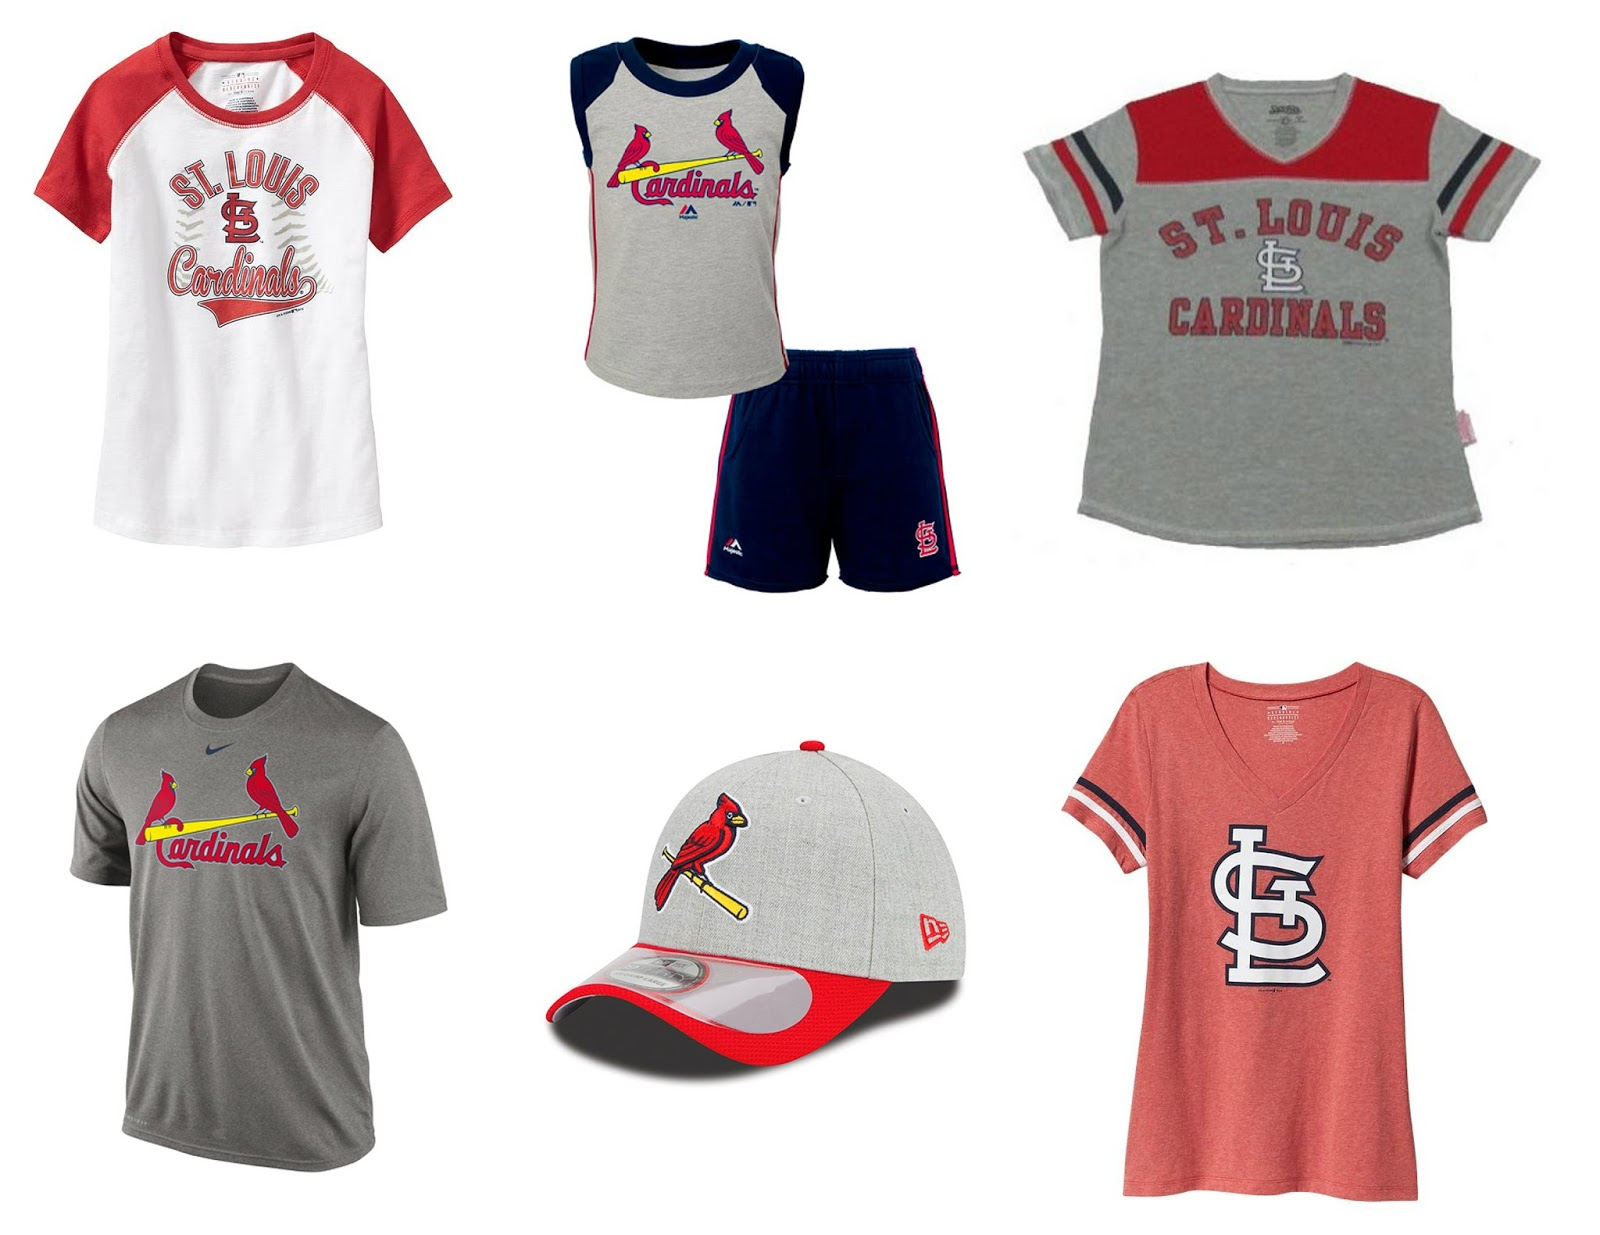 71dbd906 Whatever Dee-Dee wants, she's gonna get it: St Louis Cardinals Gear ...